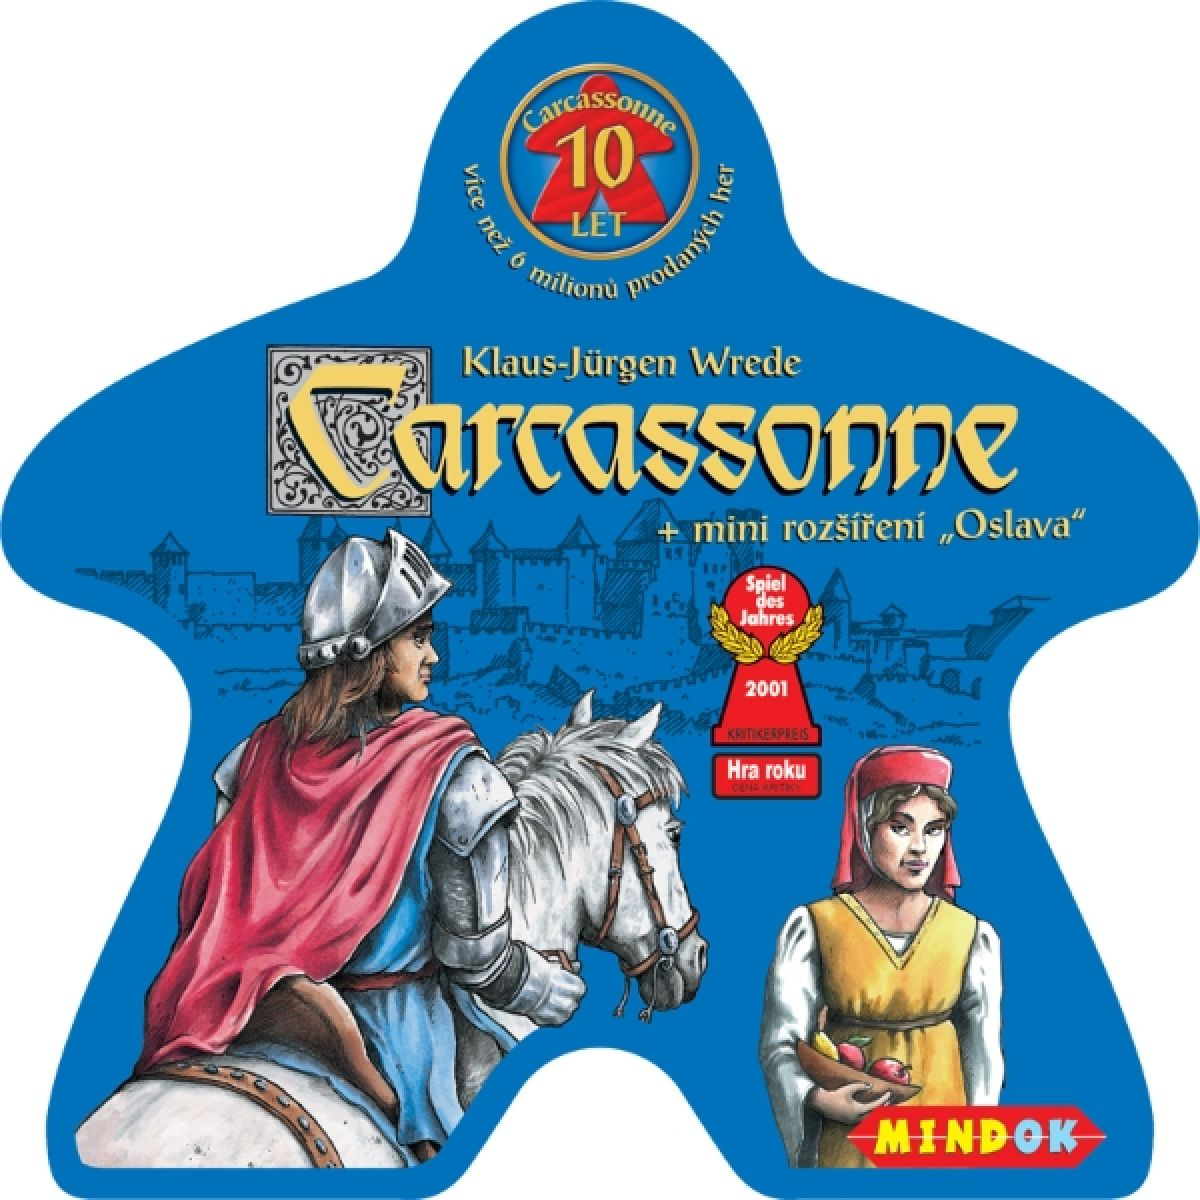 Carcassonne jubilejní edice 10 let